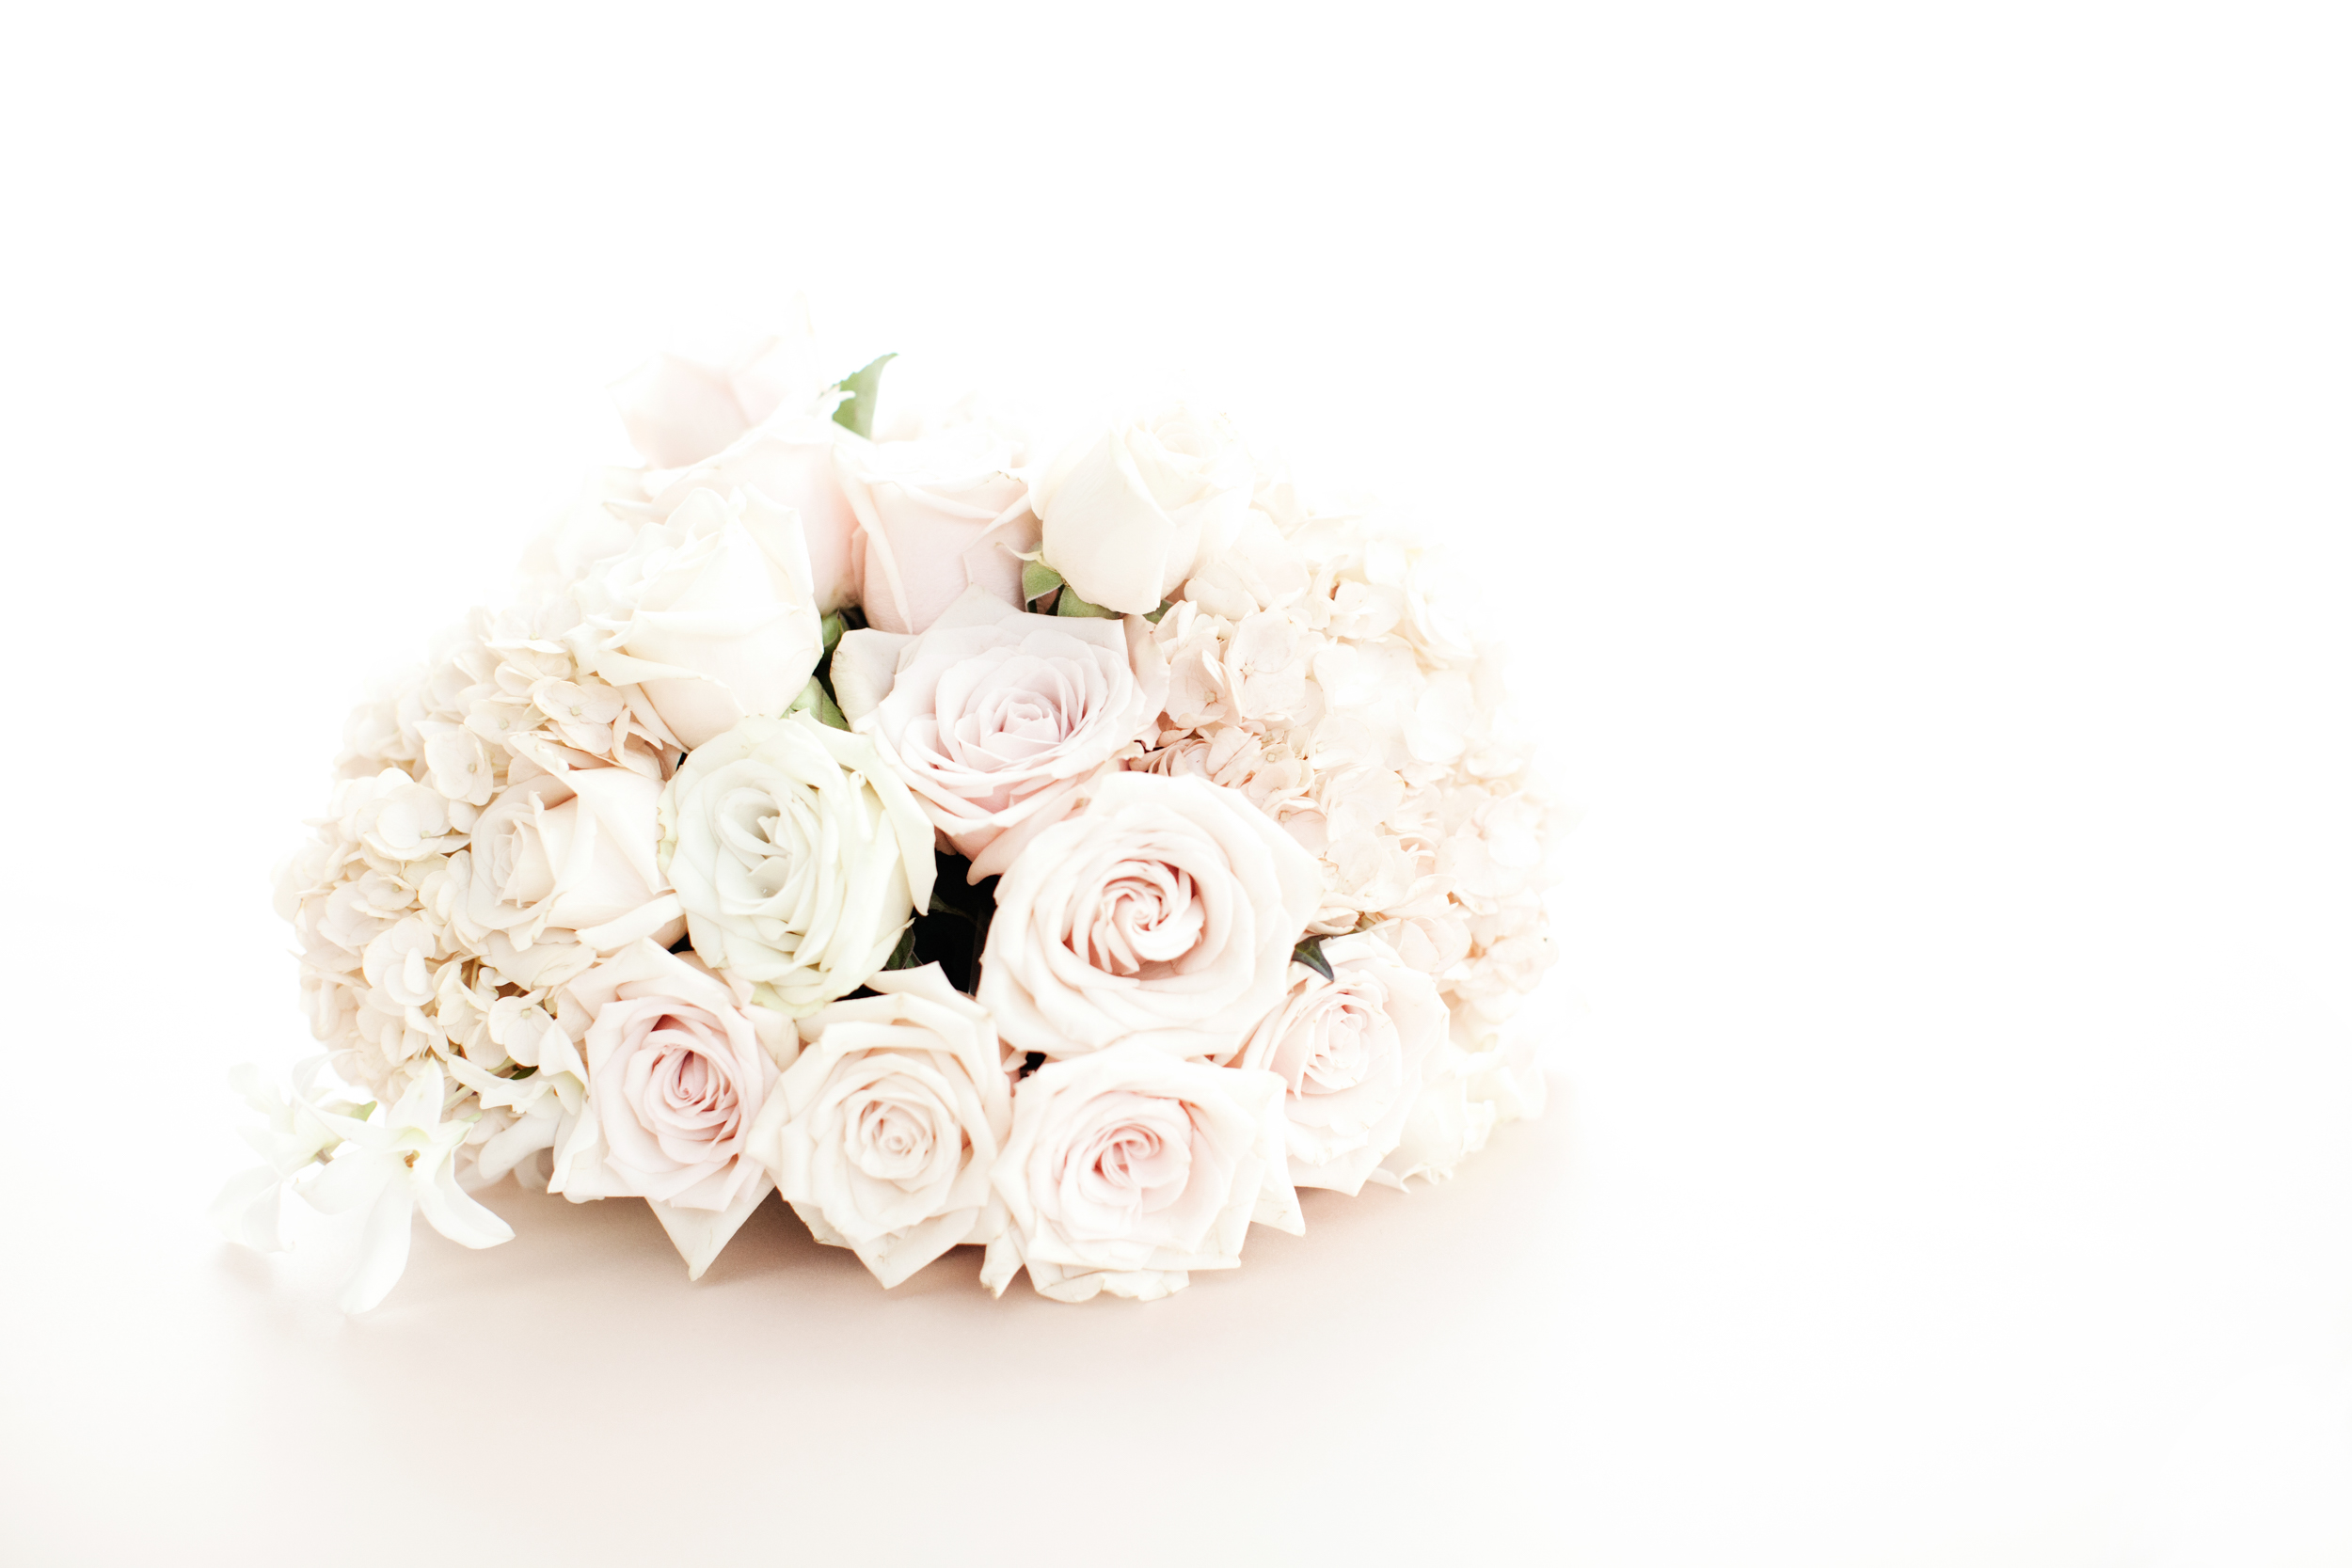 Ceci_New_York_Ceci_Style_Ceci_Johnson_Luxury_Lifestyle_Floral_Lace_Wedding_Letterpress_Inspiration_Design_Custom_Couture_Personalized_Invitations_-88.jpg